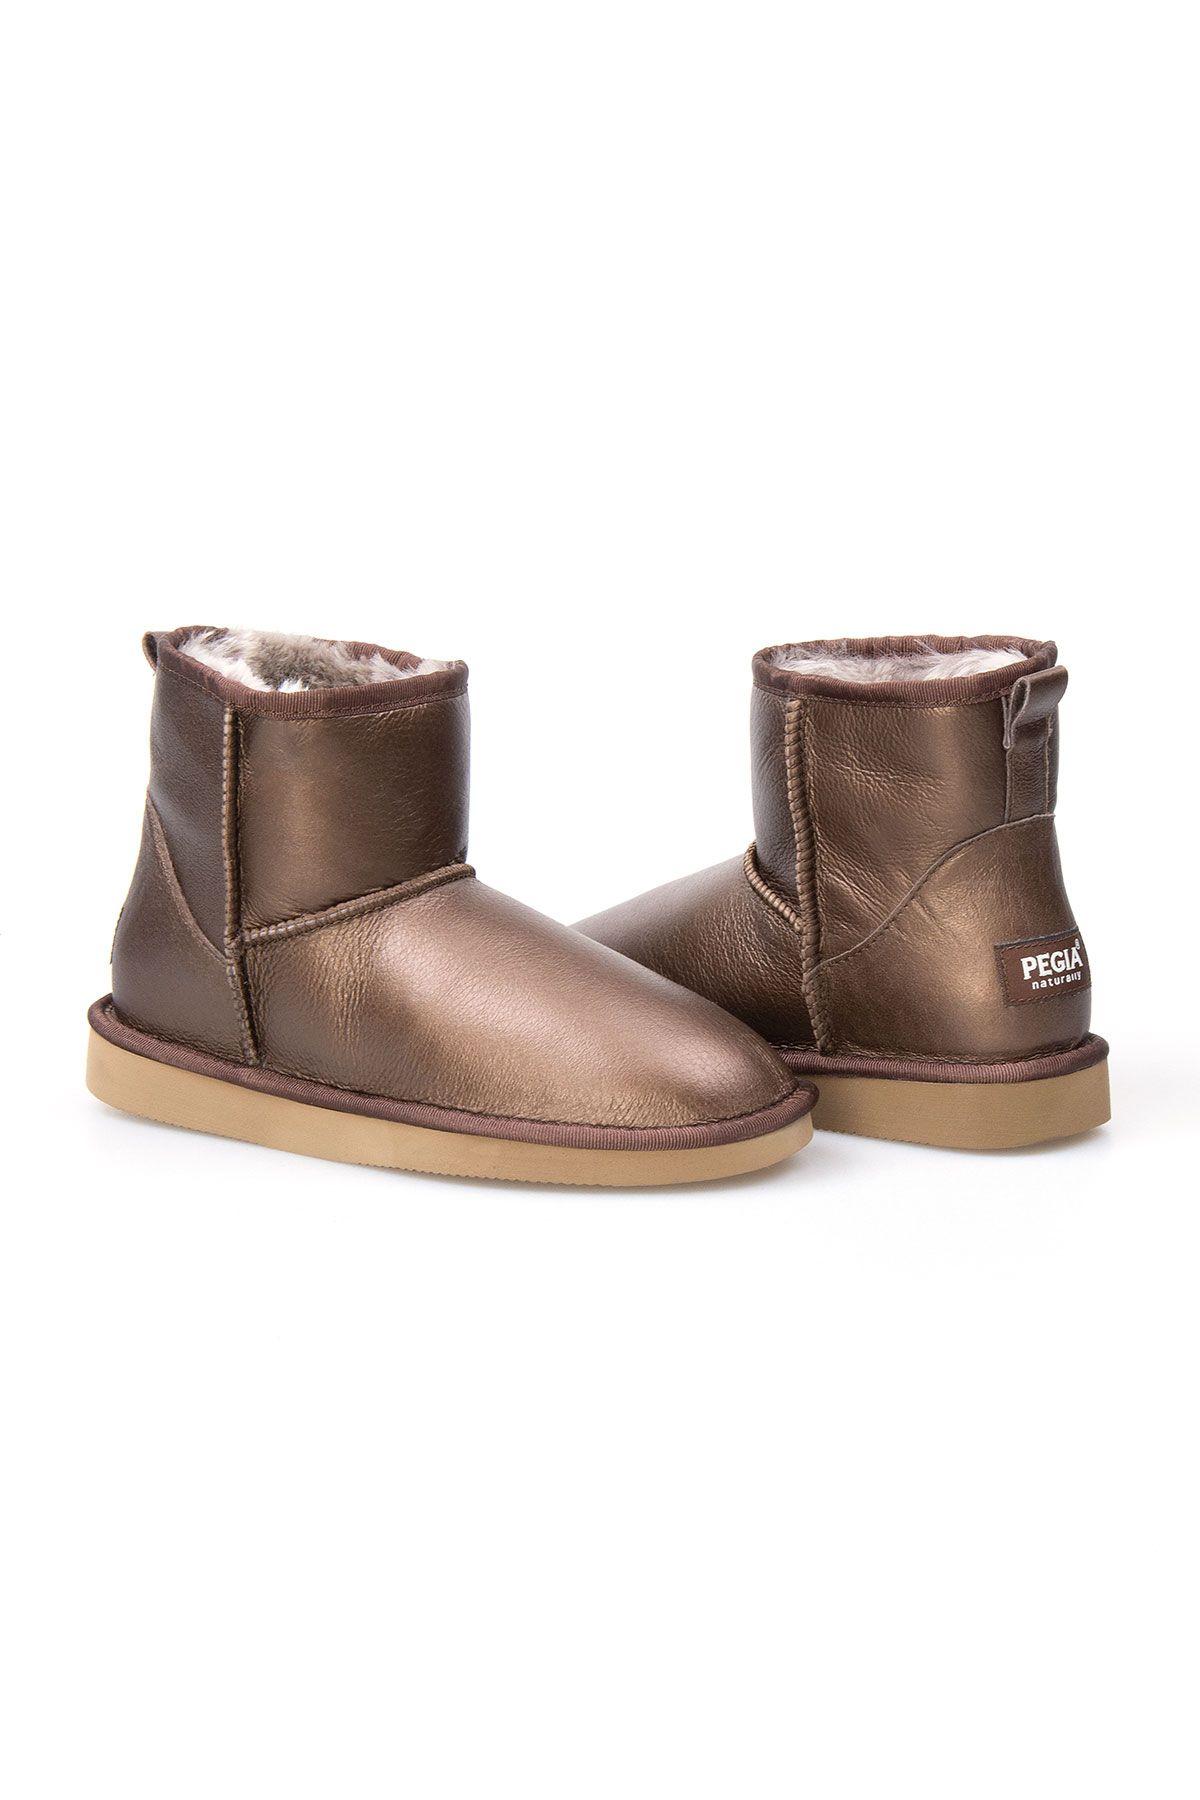 Pegia Genuine Sheepskin Metallic Women's Boots 191108 Brown